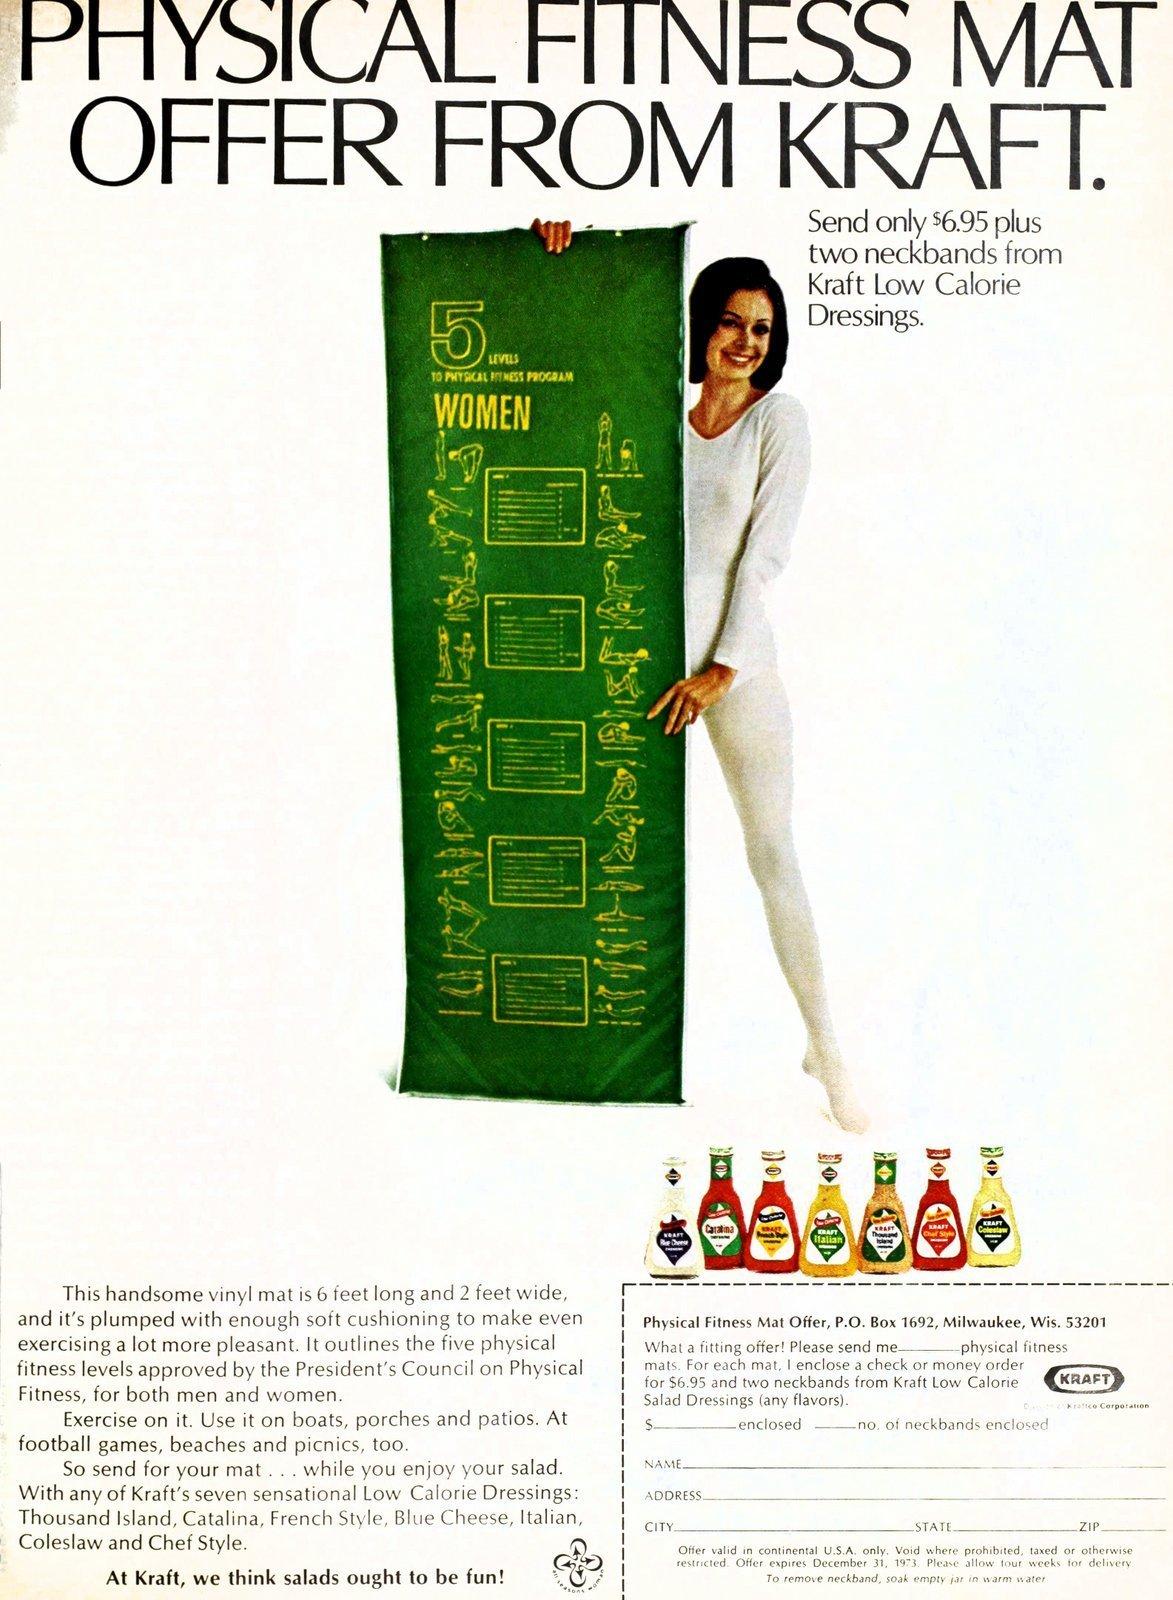 Vintage Kraft physical fitness - yoga mat offer - Salad dressing tie-in (1973)